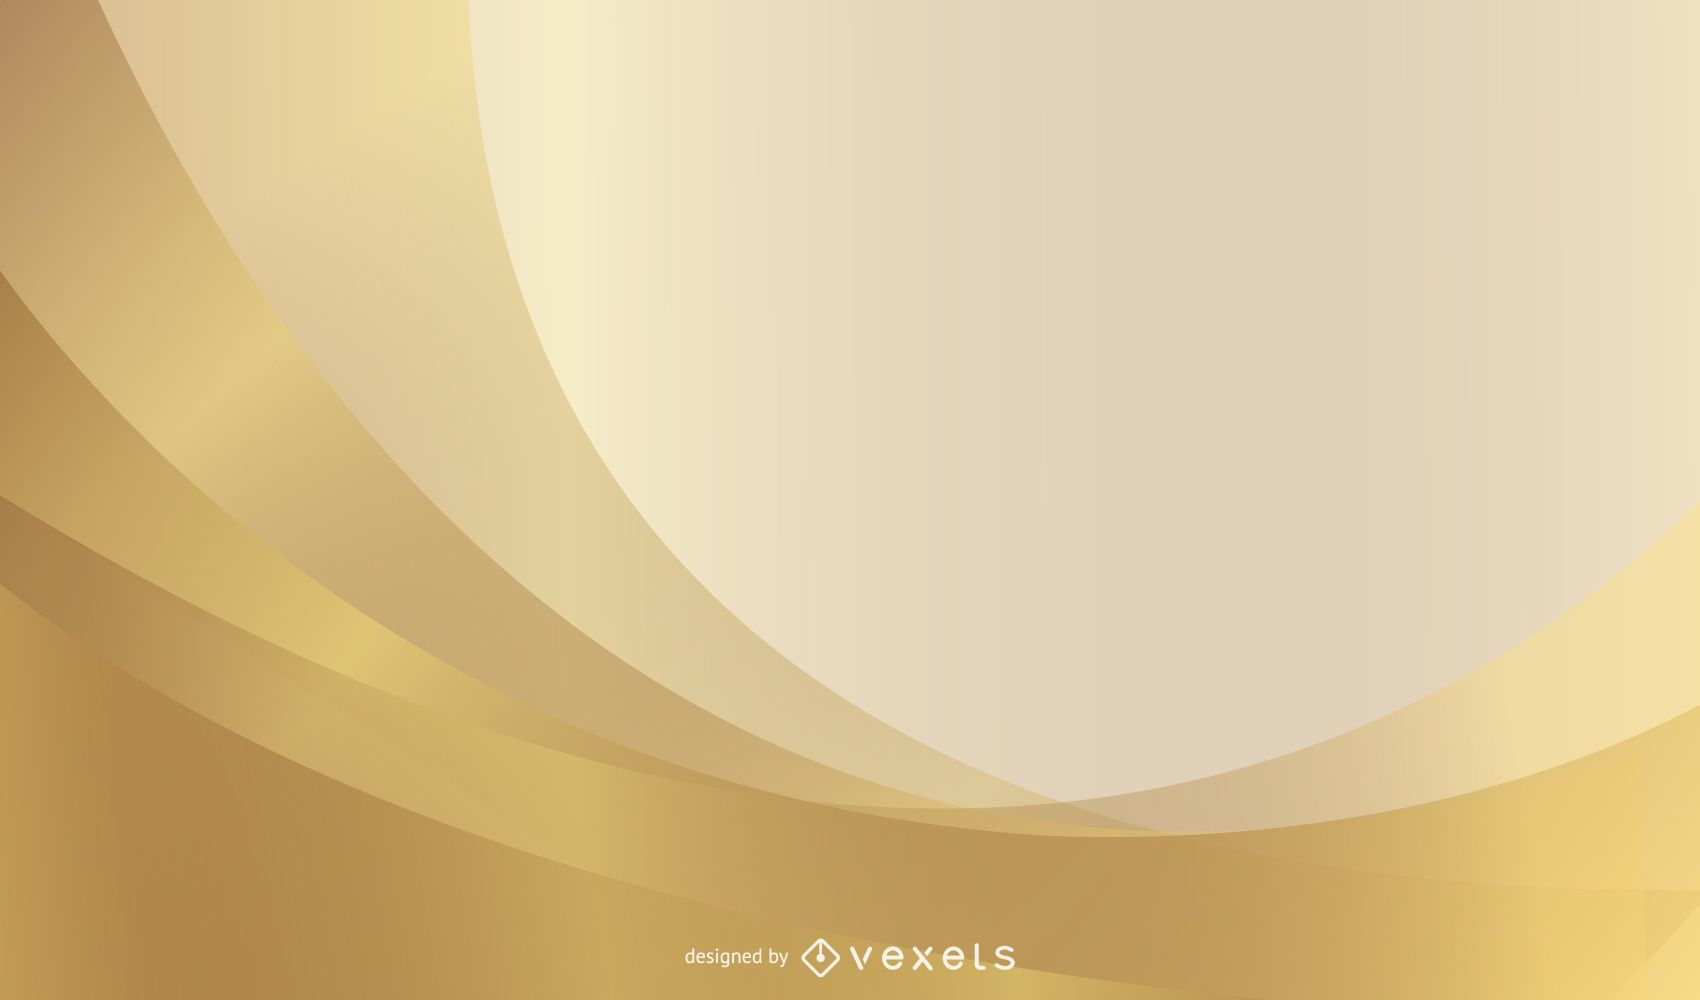 Golden Waves Background PSD